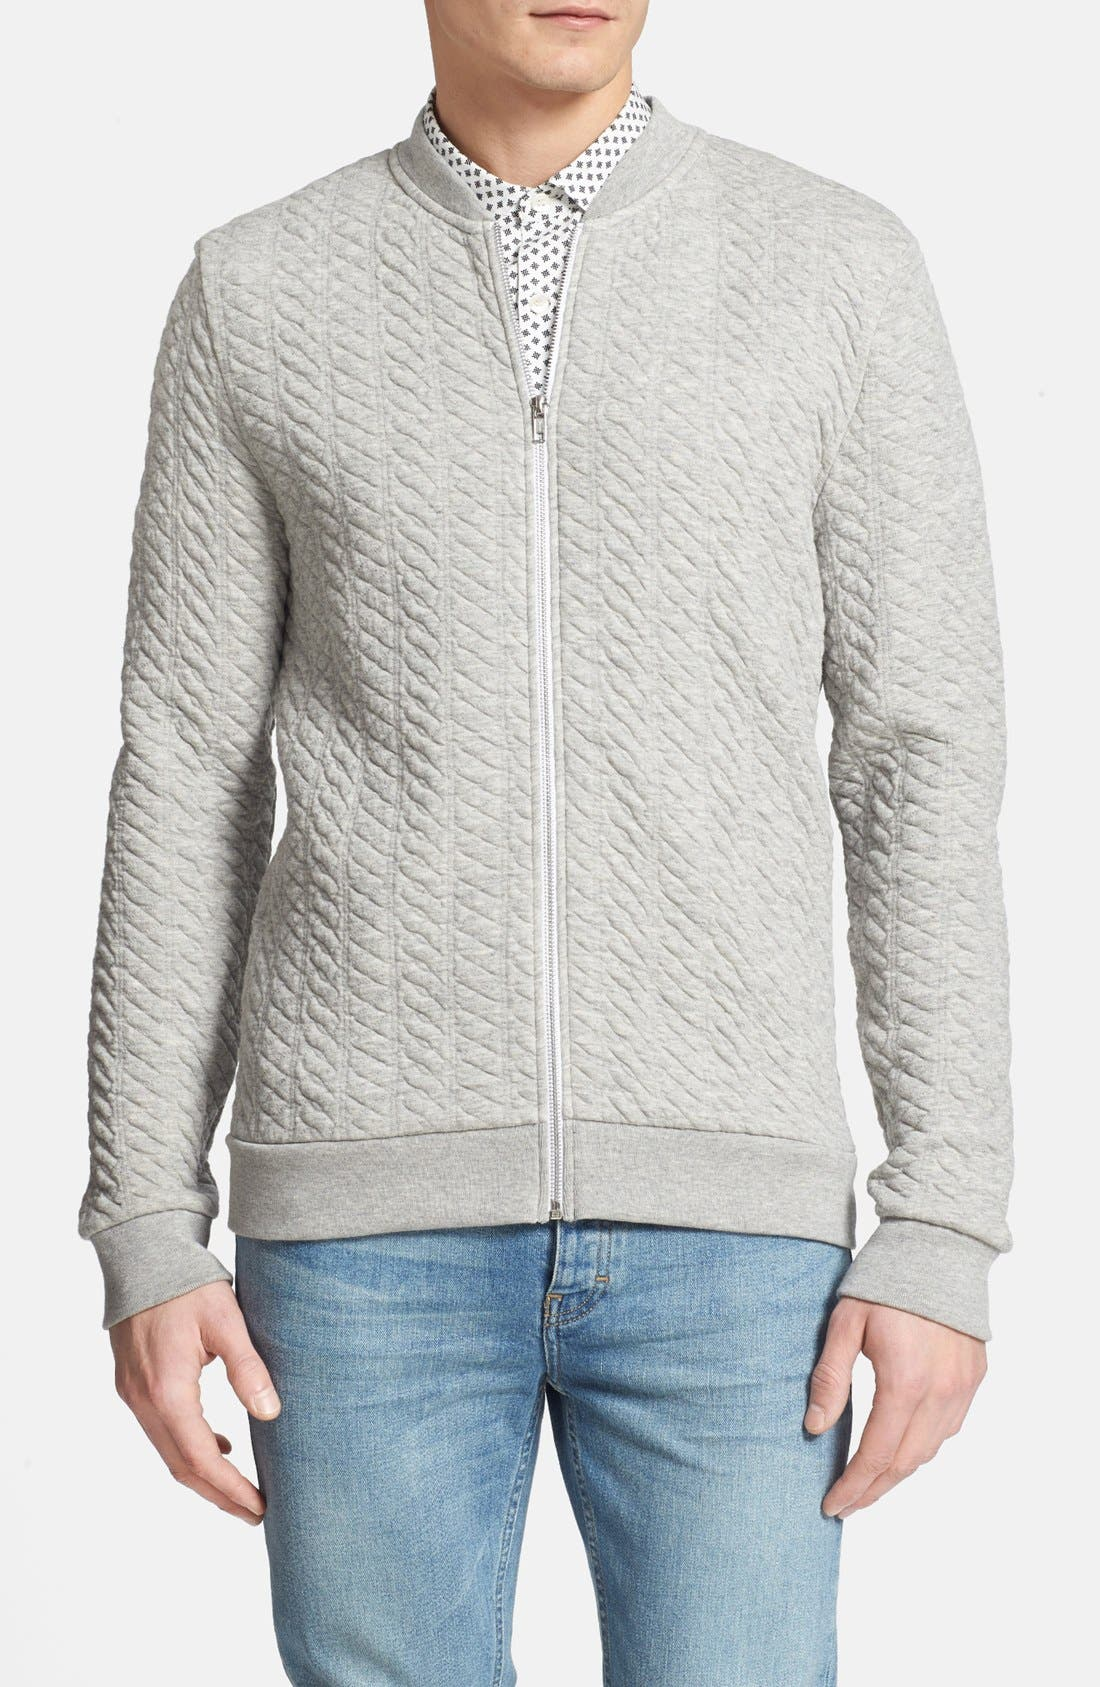 Alternate Image 1 Selected - Topman Mini Cable Jersey Zip Sweatshirt